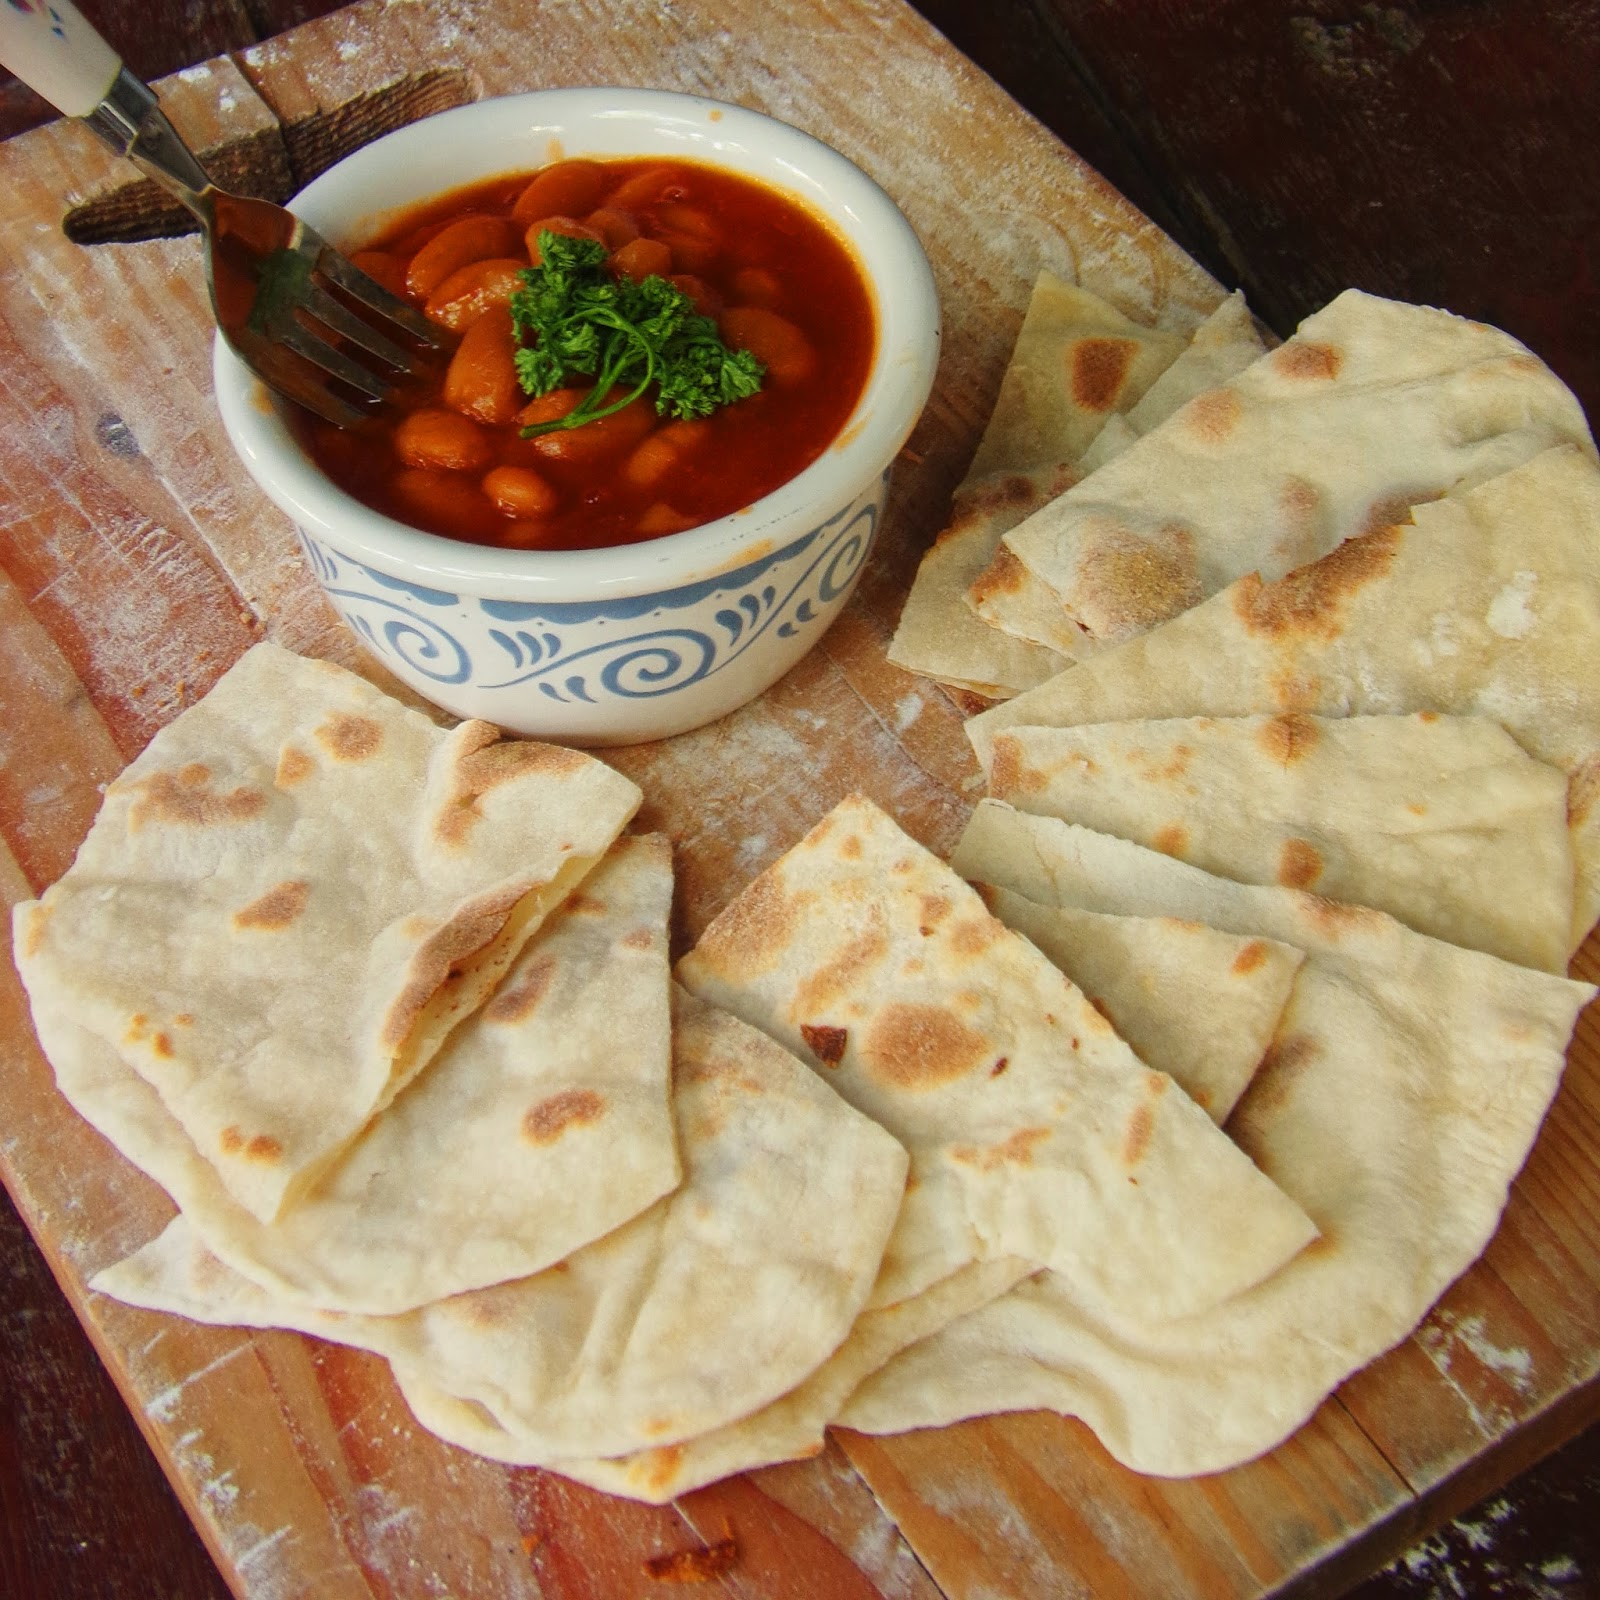 pork and beans recipe, pork n beans, pork beans, pork & beans, how to make pork and beans, how to make flat bread